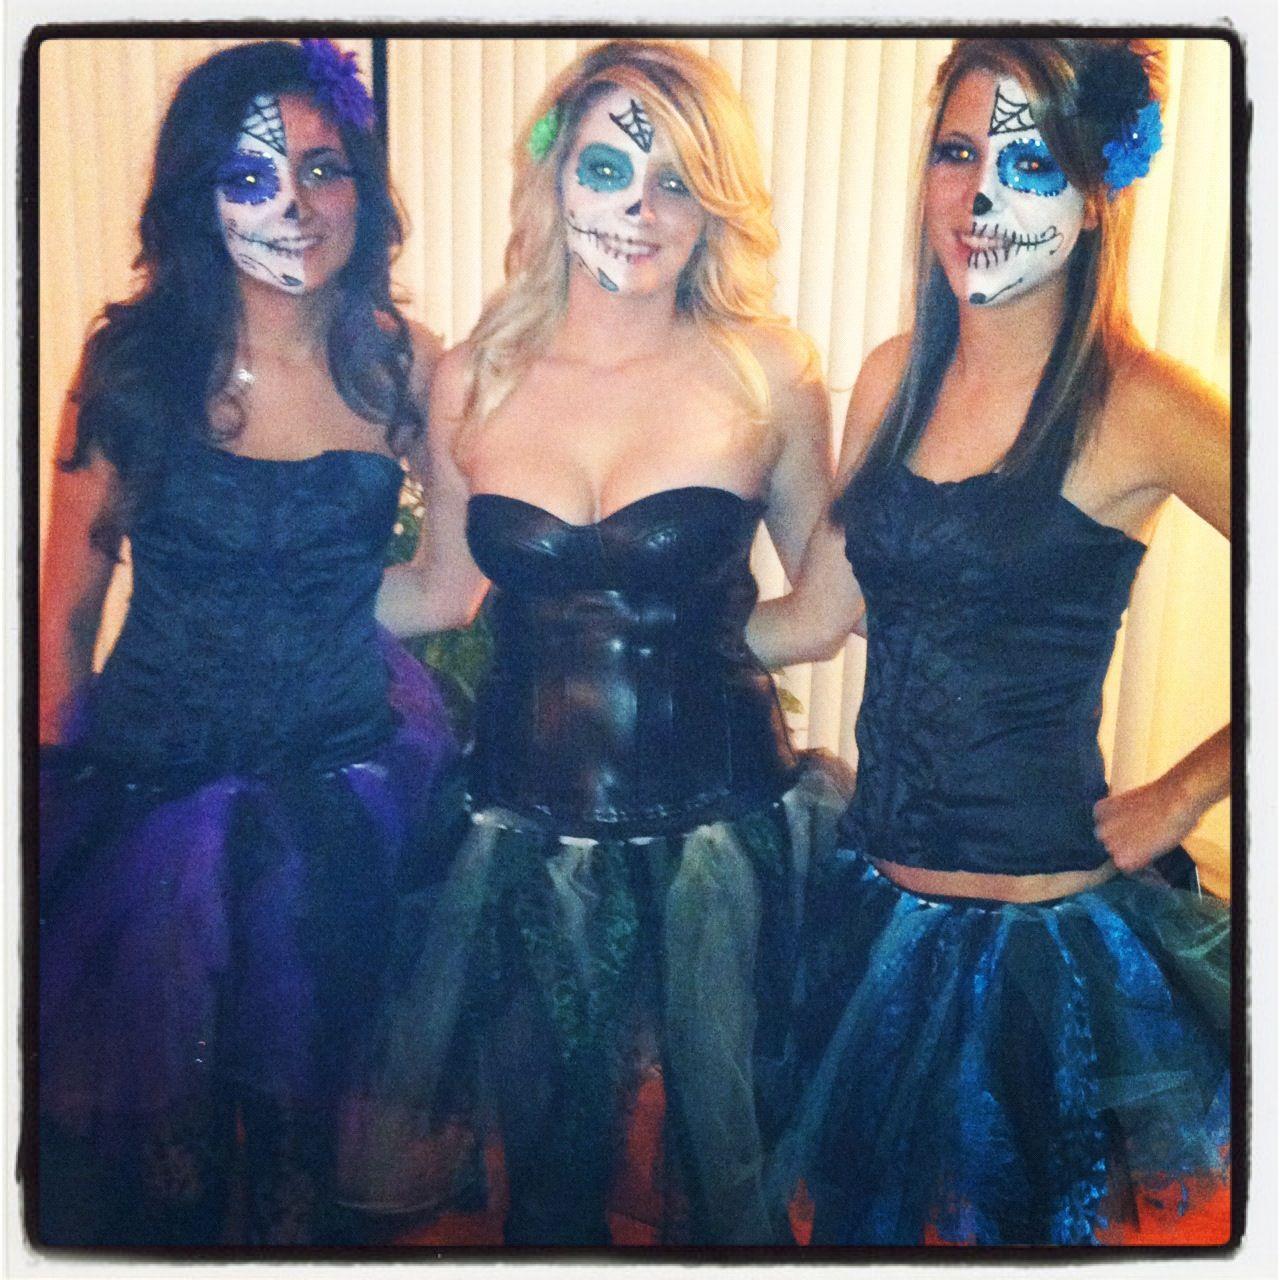 6eae51c6951 Sugar skull costumes w/ homemade tutus | Halloween ideas | Halloween ...